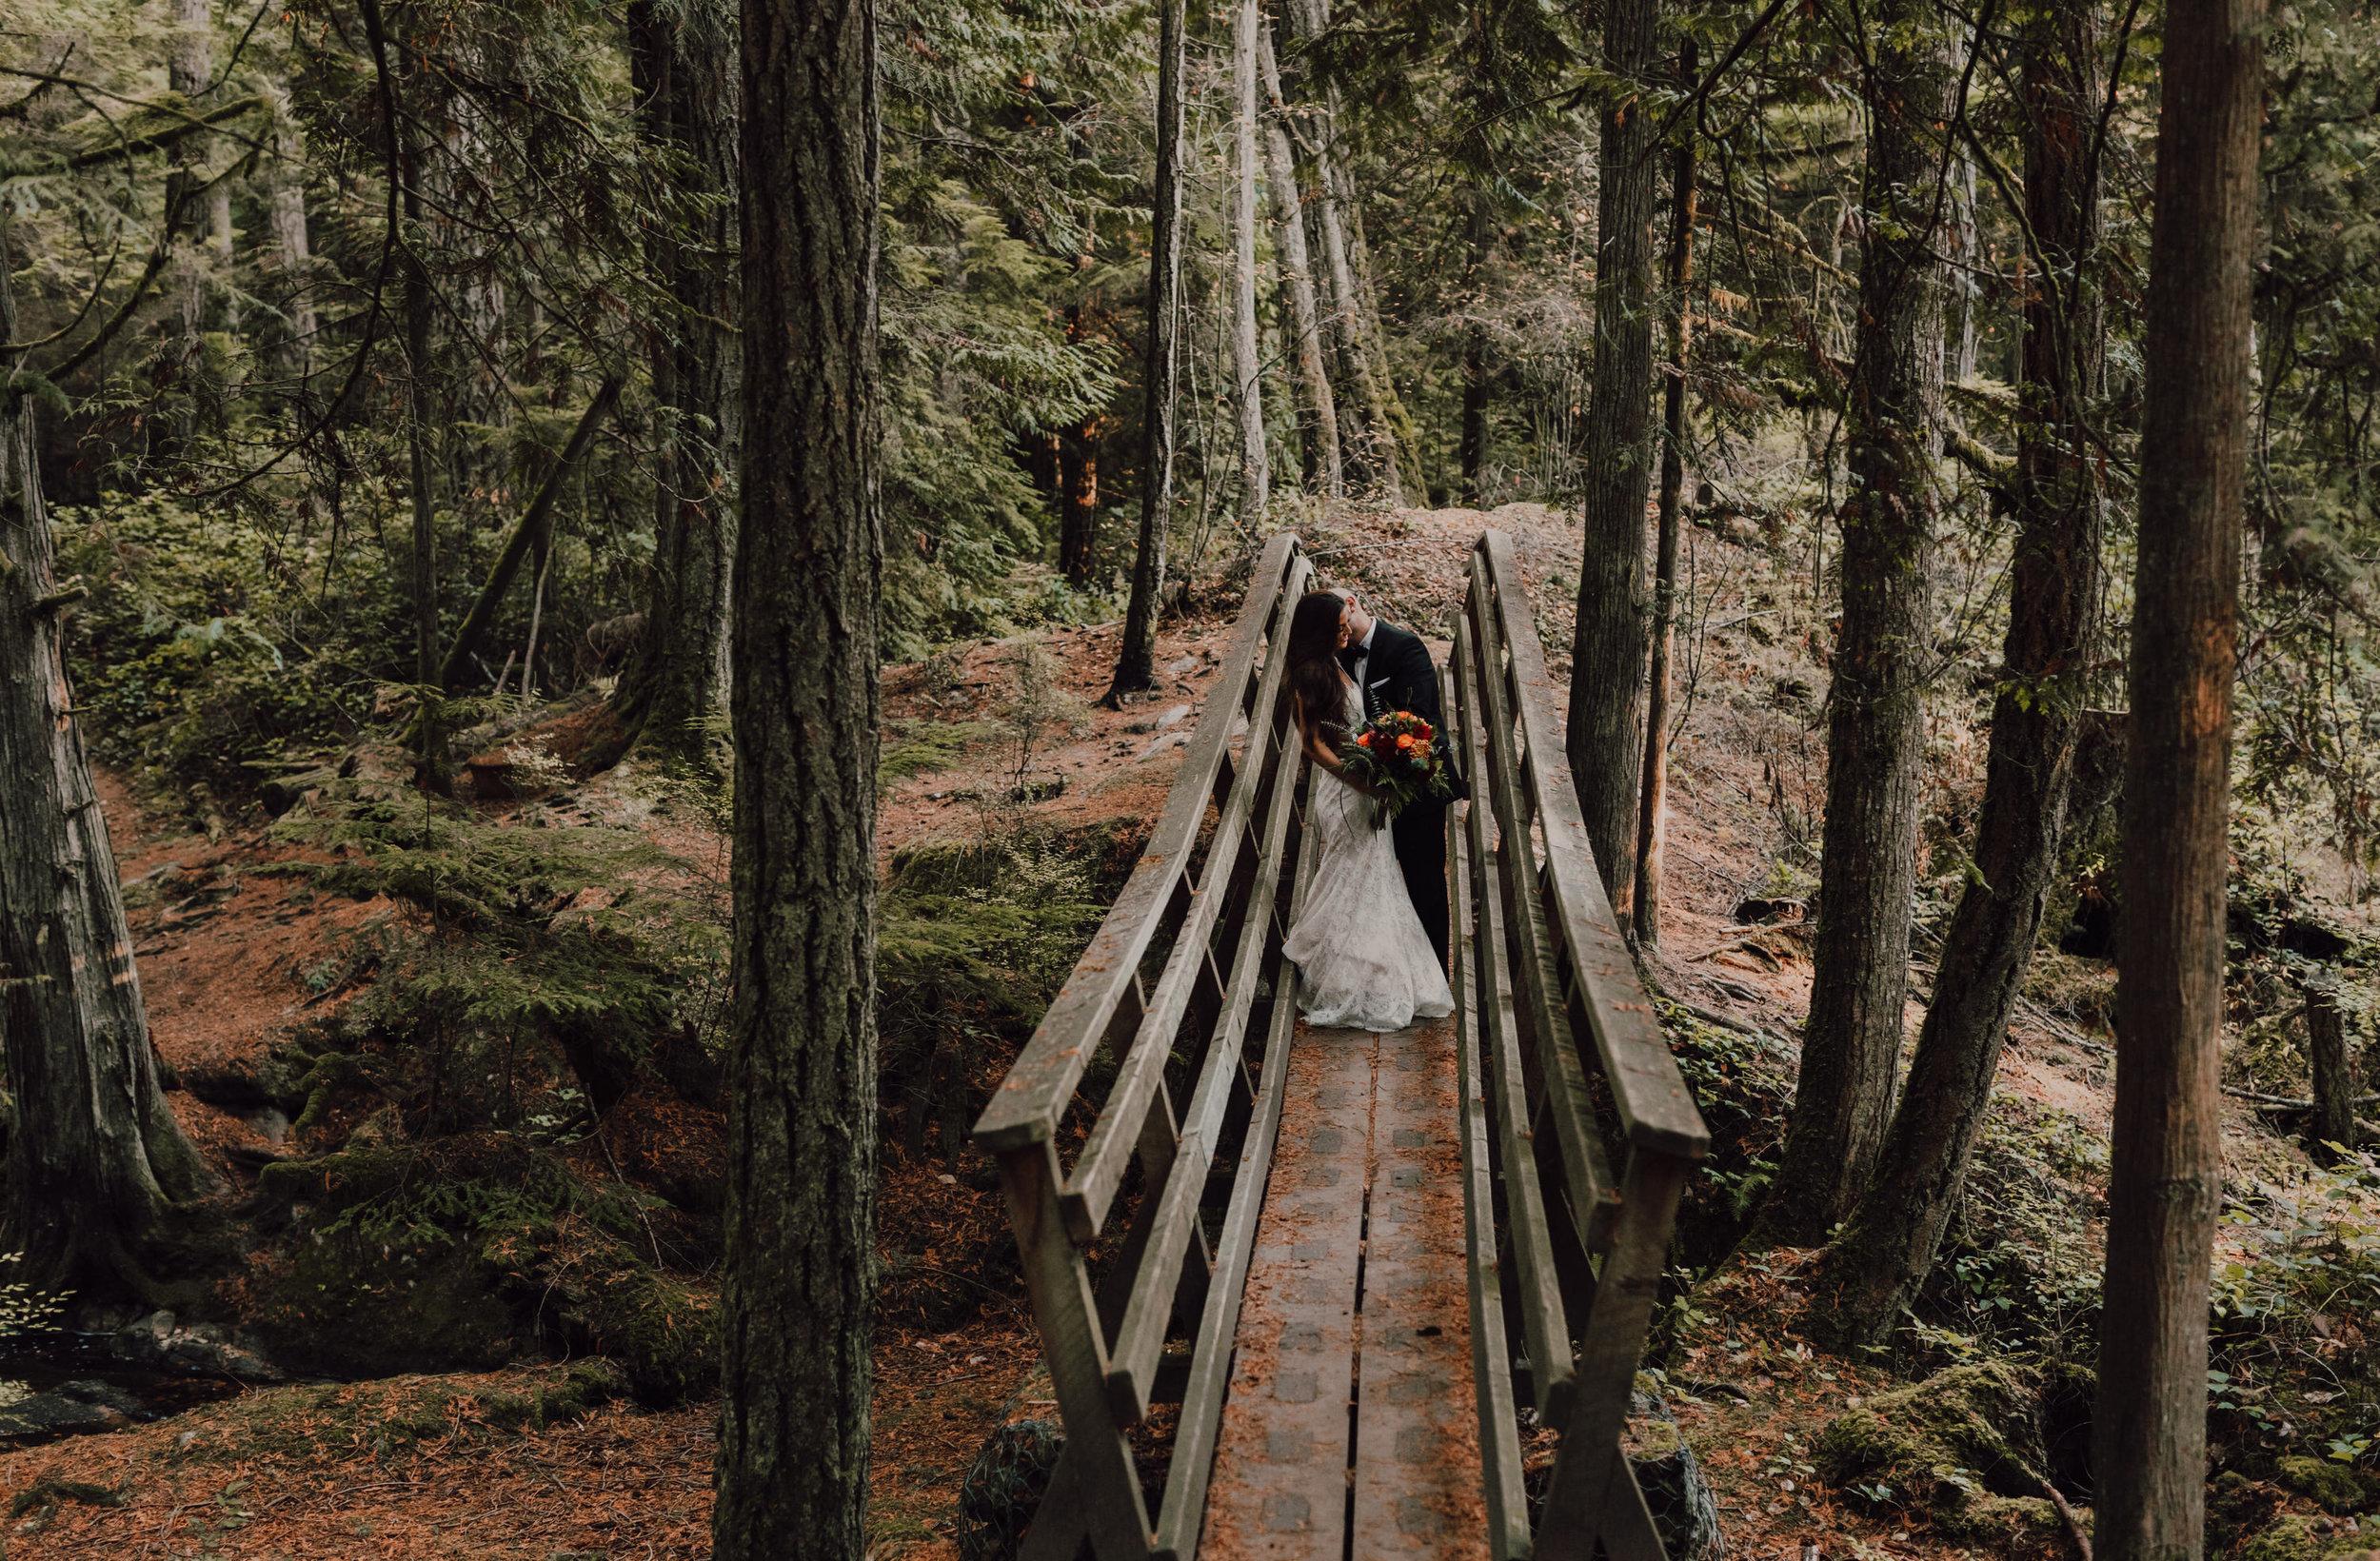 Day After Wedding Photos - Sunshine Coast Wedding Photos - Sunset Wedding Photos - Vancouver Wedding Photographer & Videographer - Sunshine Coast Wedding Photos - Sunshine Coast Wedding Photographer - Jennifer Picard Photography - 1A5A7916.jpg